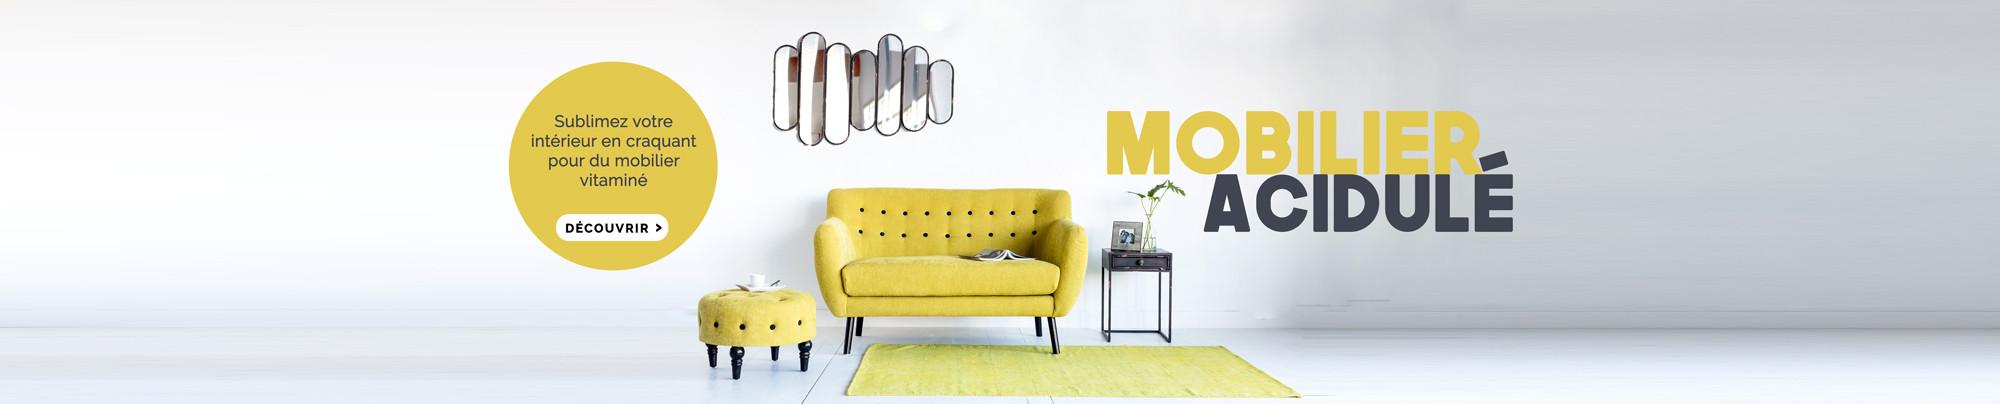 Mobilier acidulé jaune